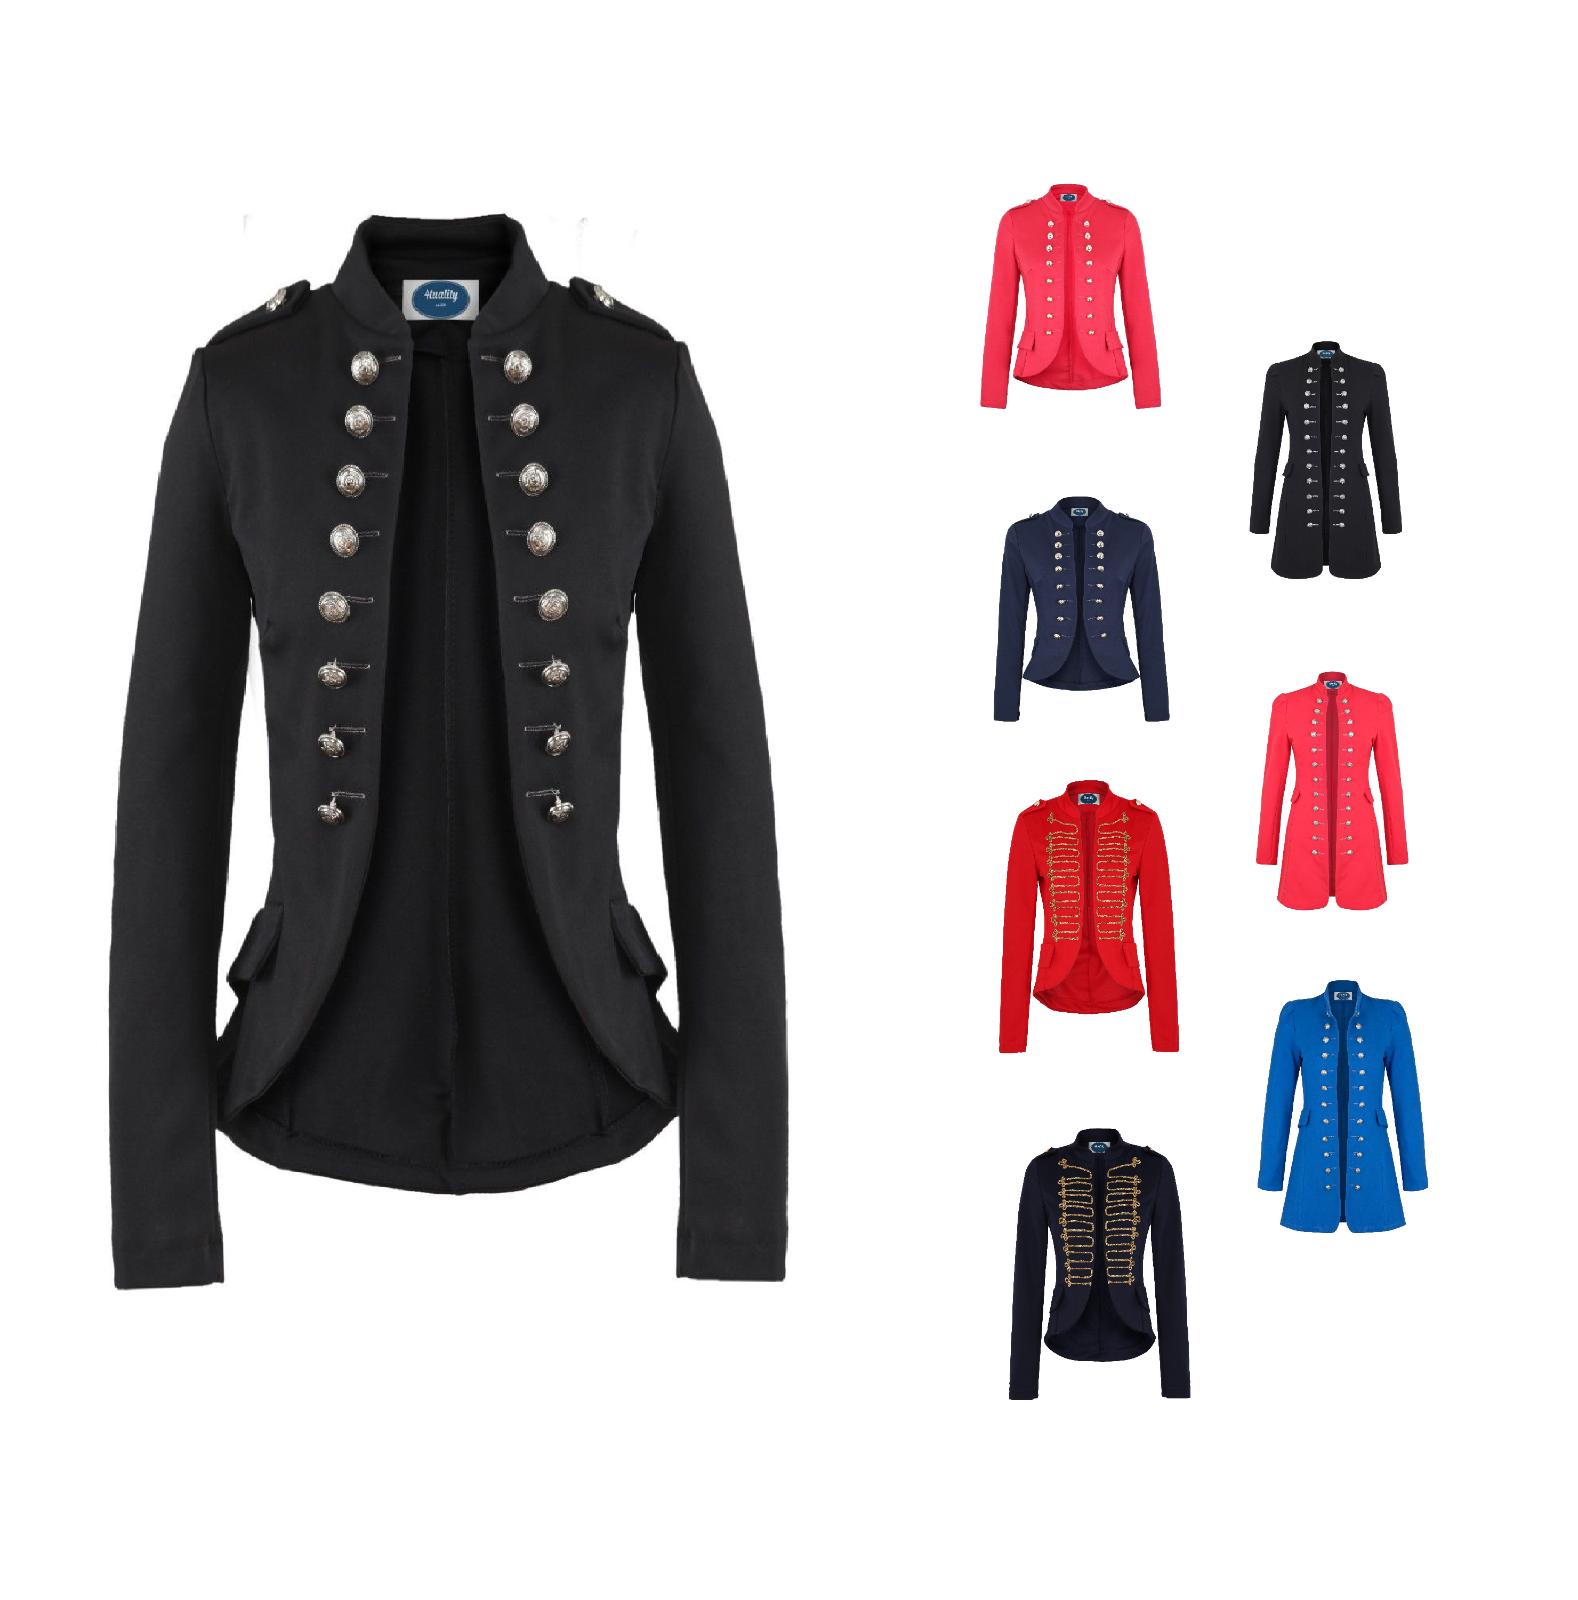 AO Blazer Uniform Stil S M L XL XXL Military Damen Karneval Business Jacke 544dae3ef2